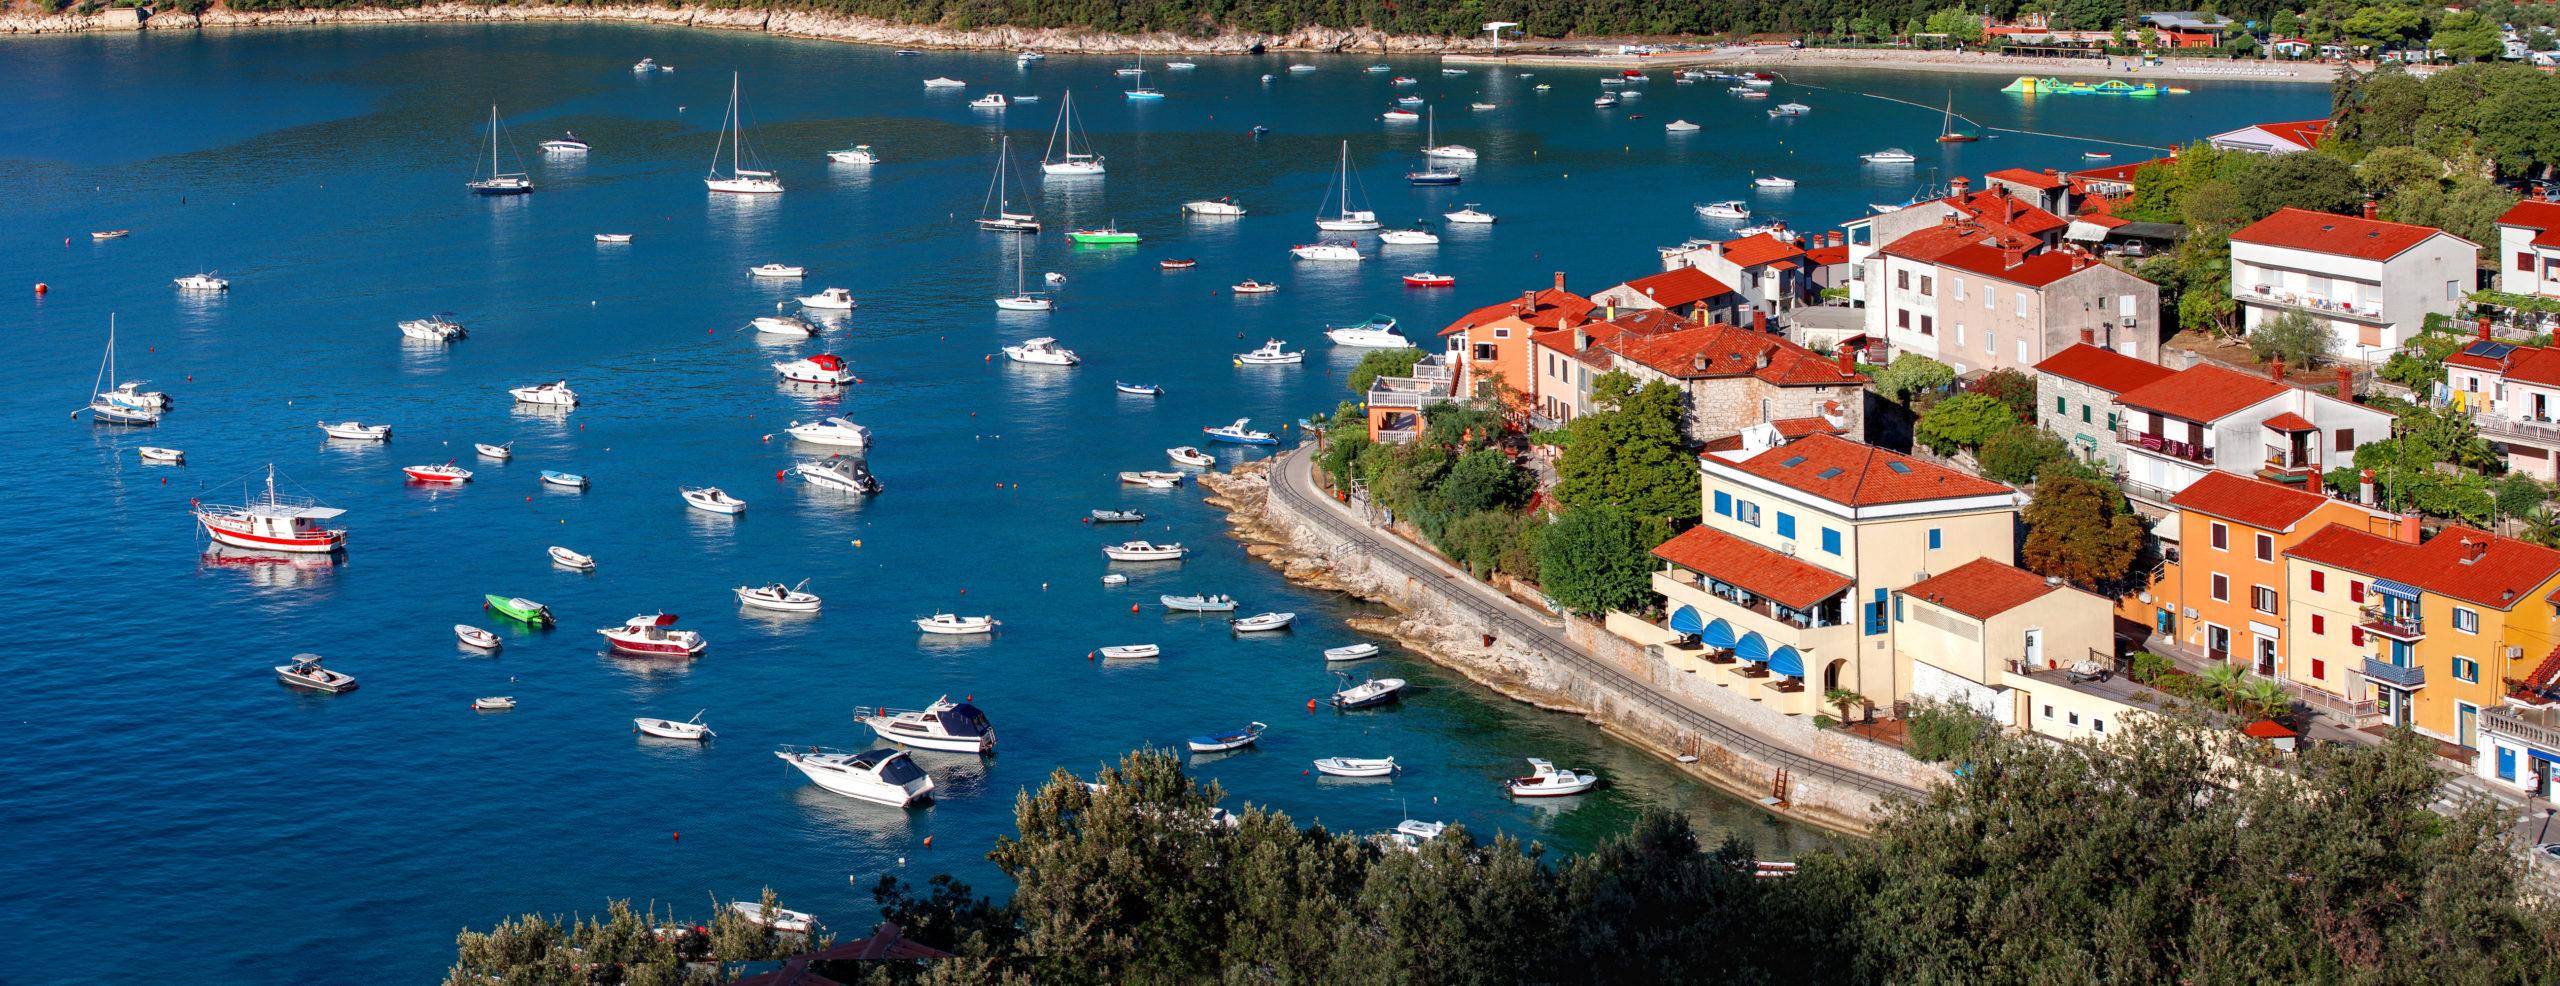 Croatia [Shutterstock]